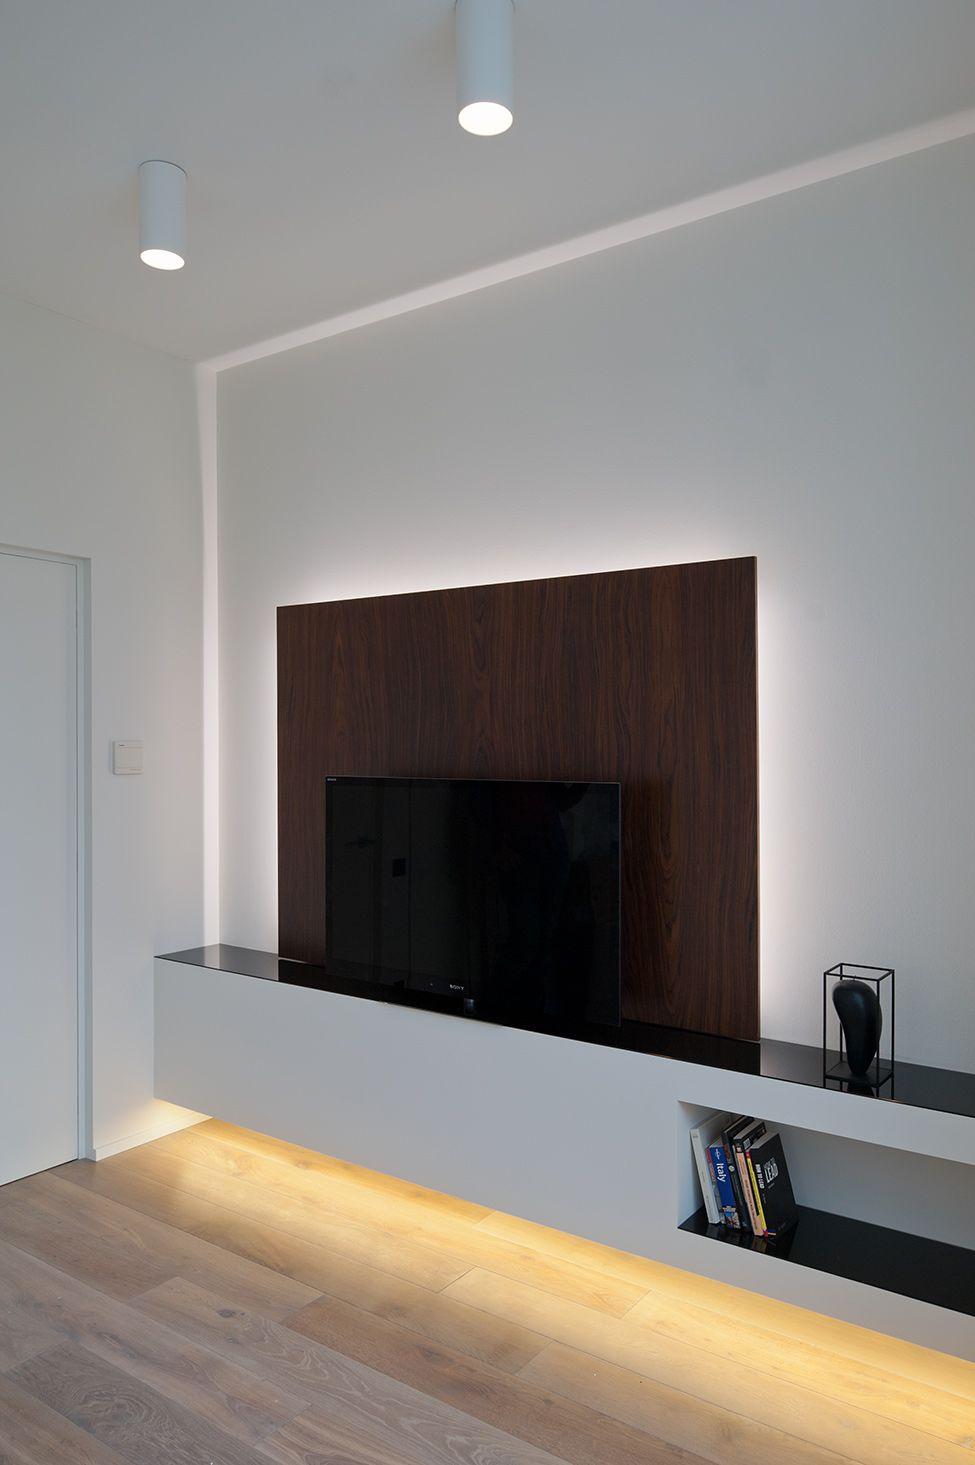 Lighting System Underneath